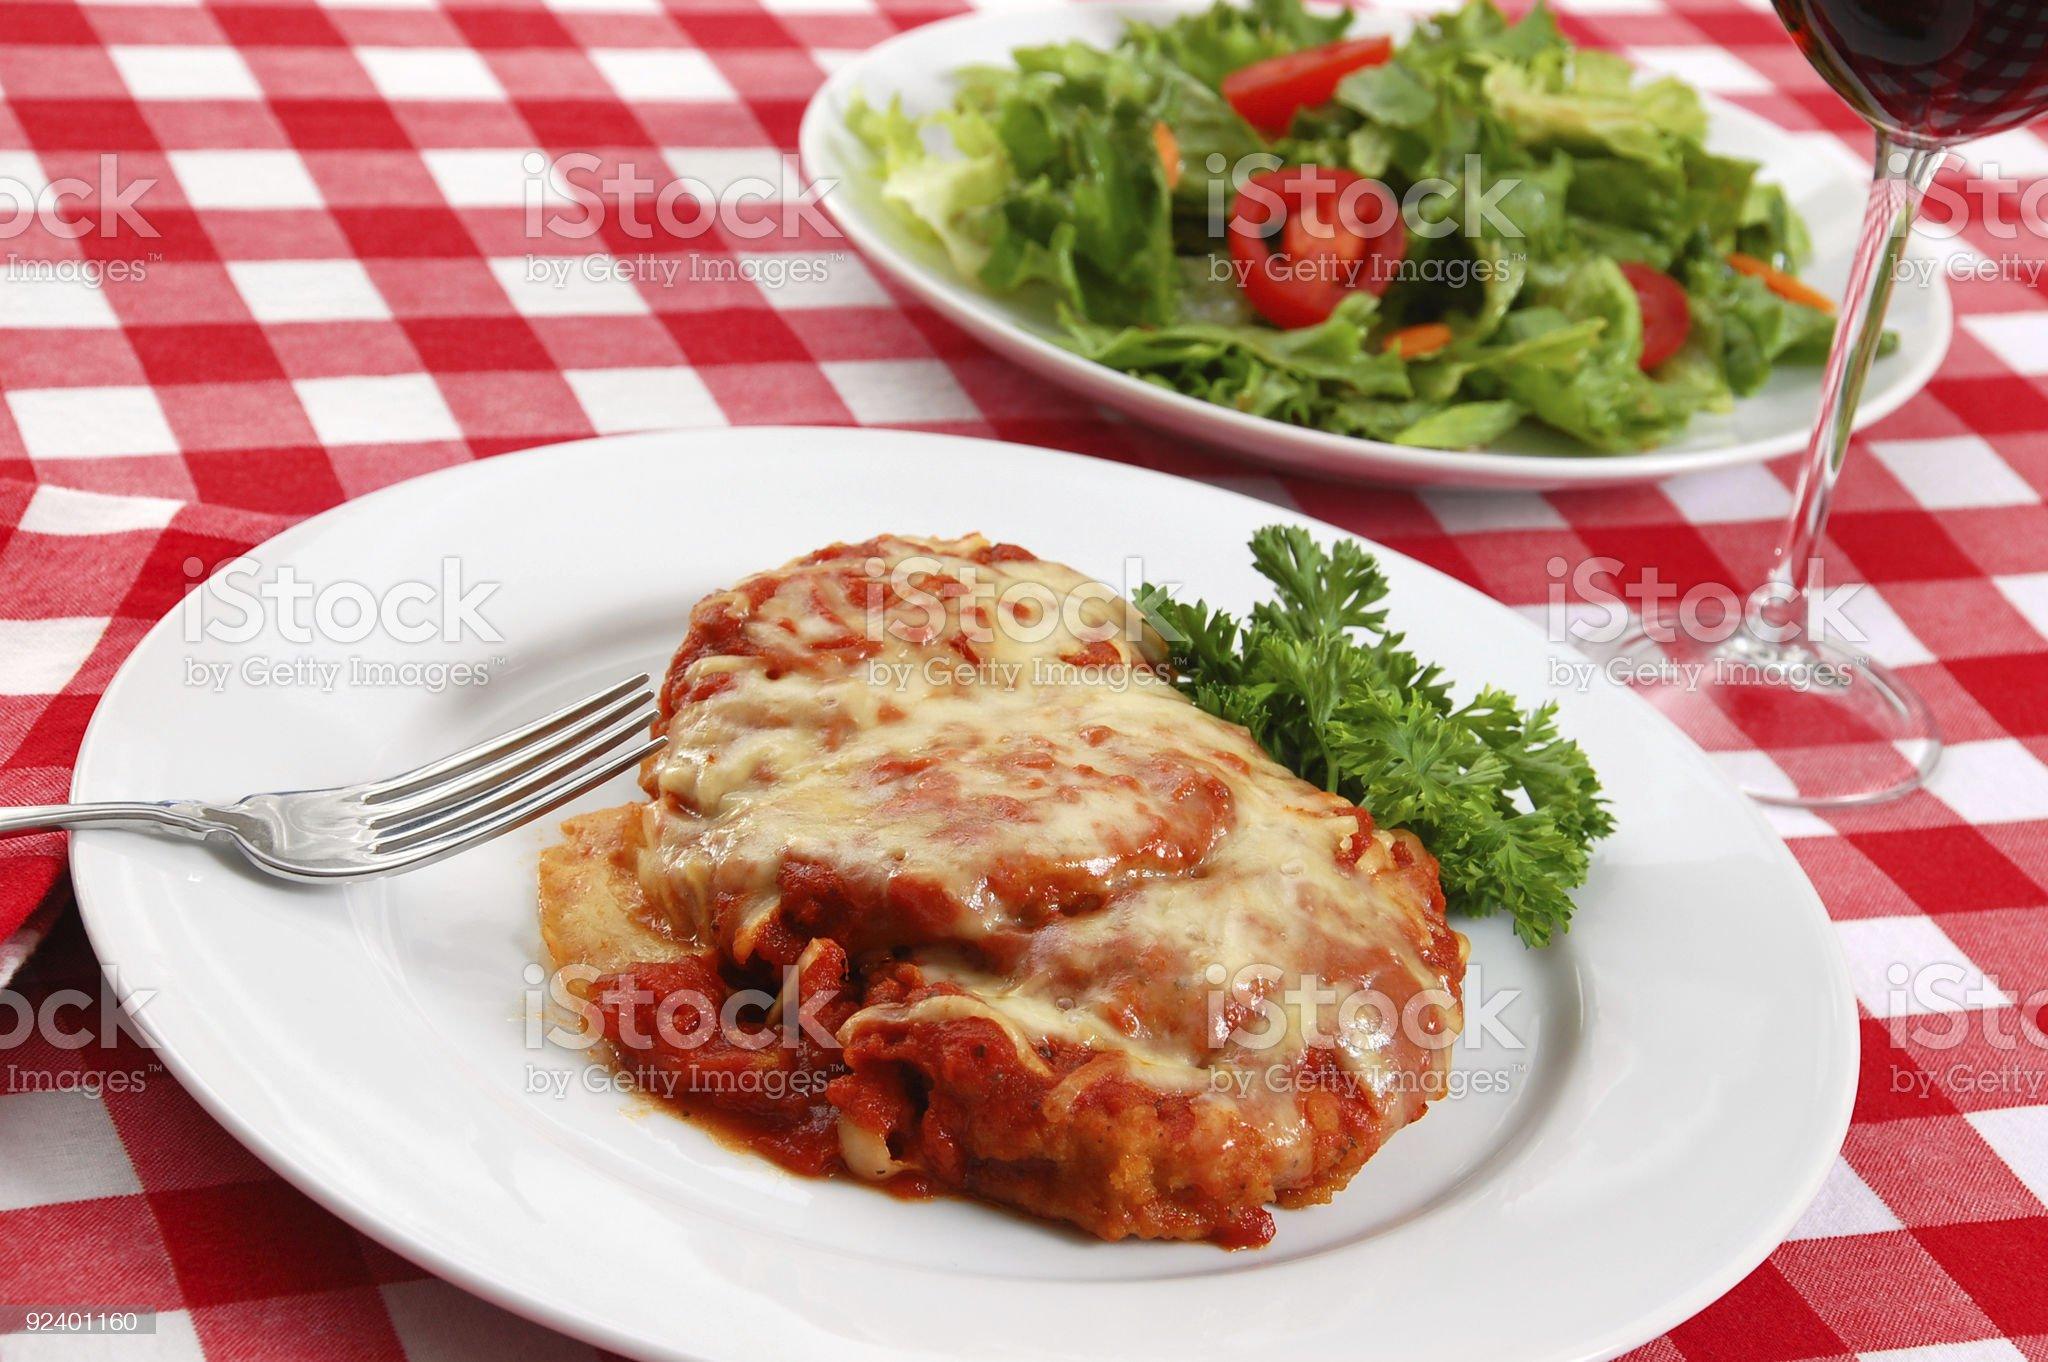 Eggplant Parmigiana and Side Salad royalty-free stock photo